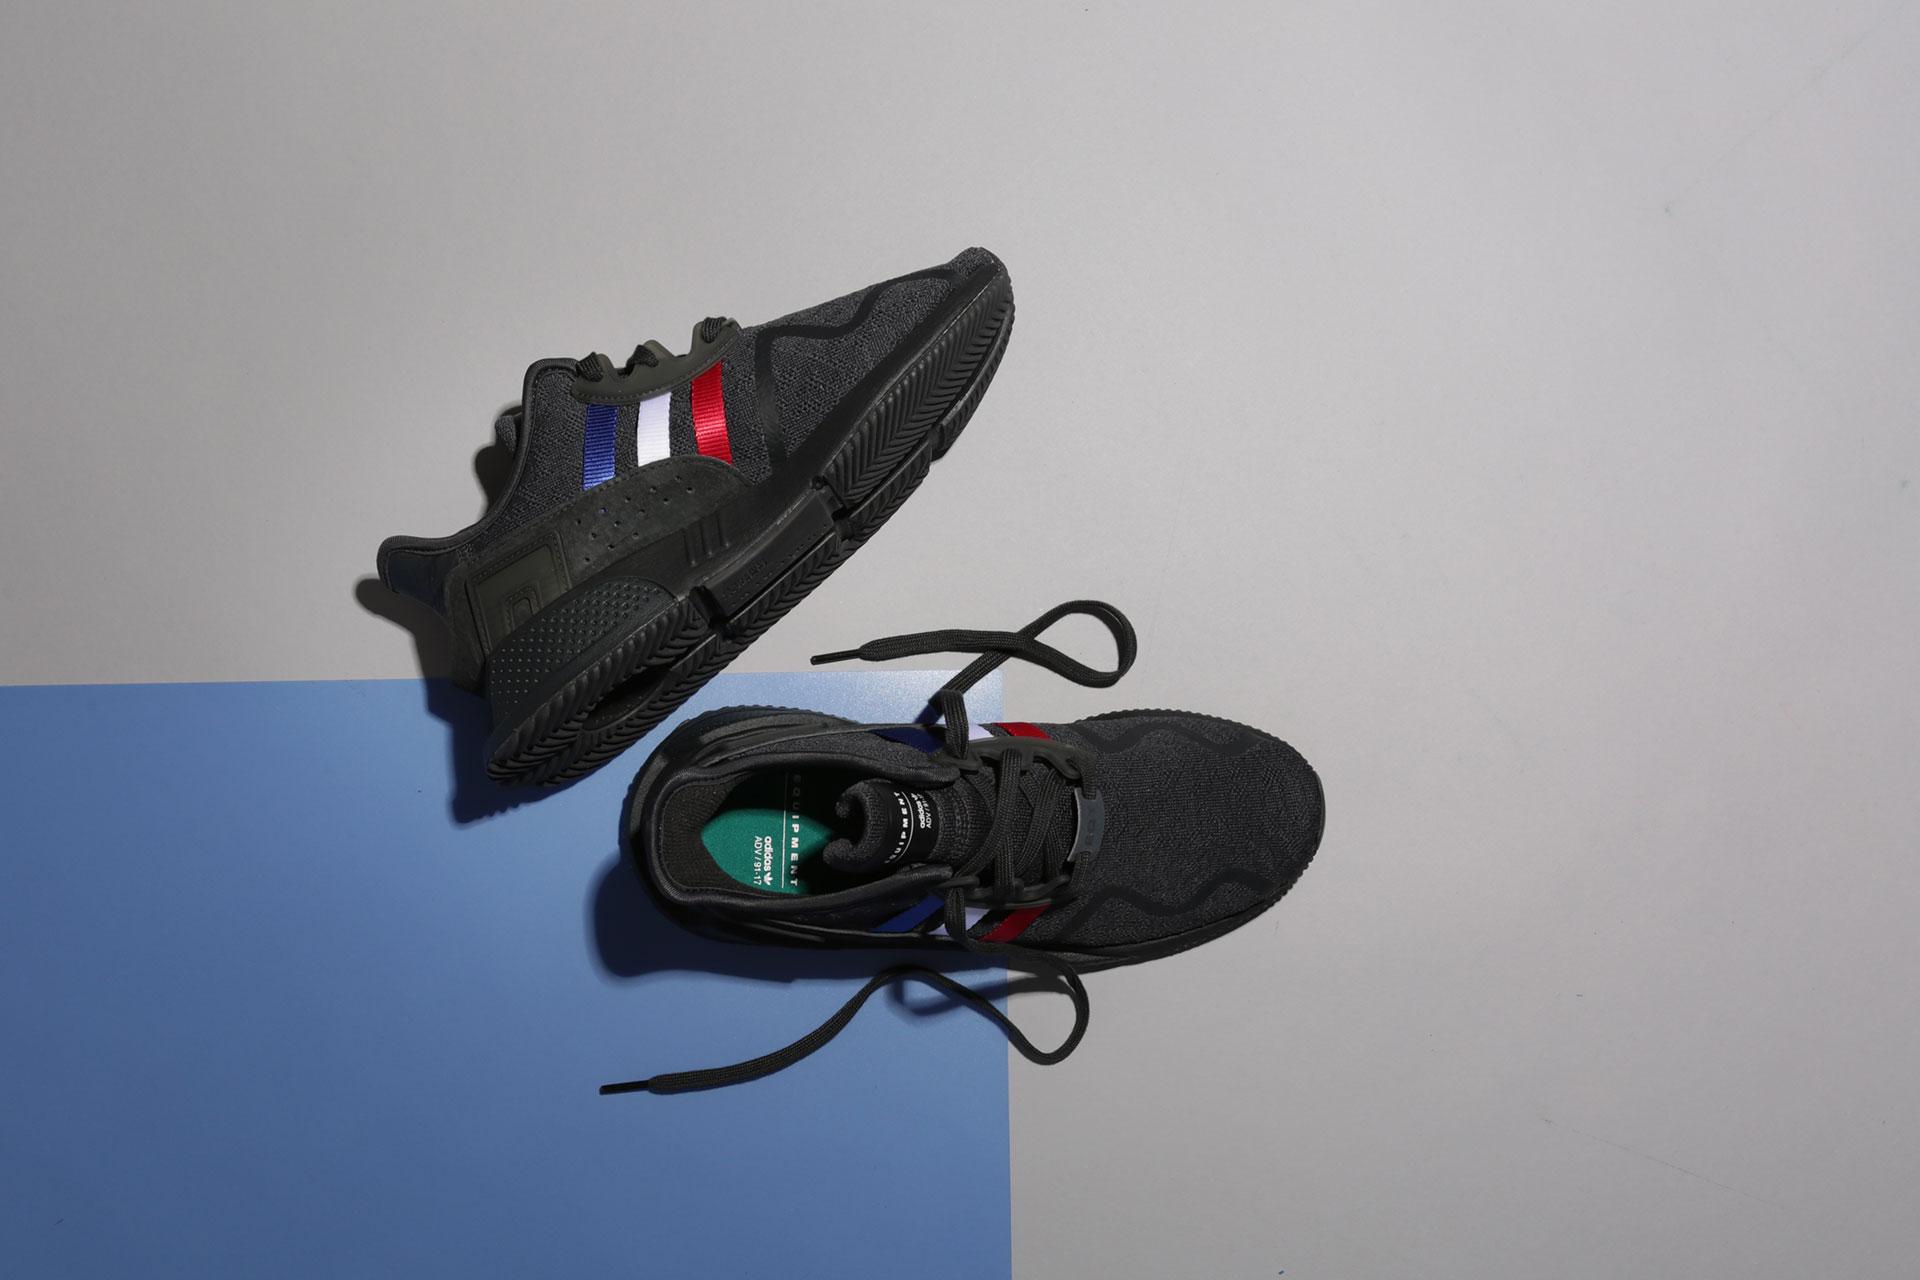 new style c9bea 7ab3d Купить серые мужские кроссовки EQT CUSHION ADV от adidas ...